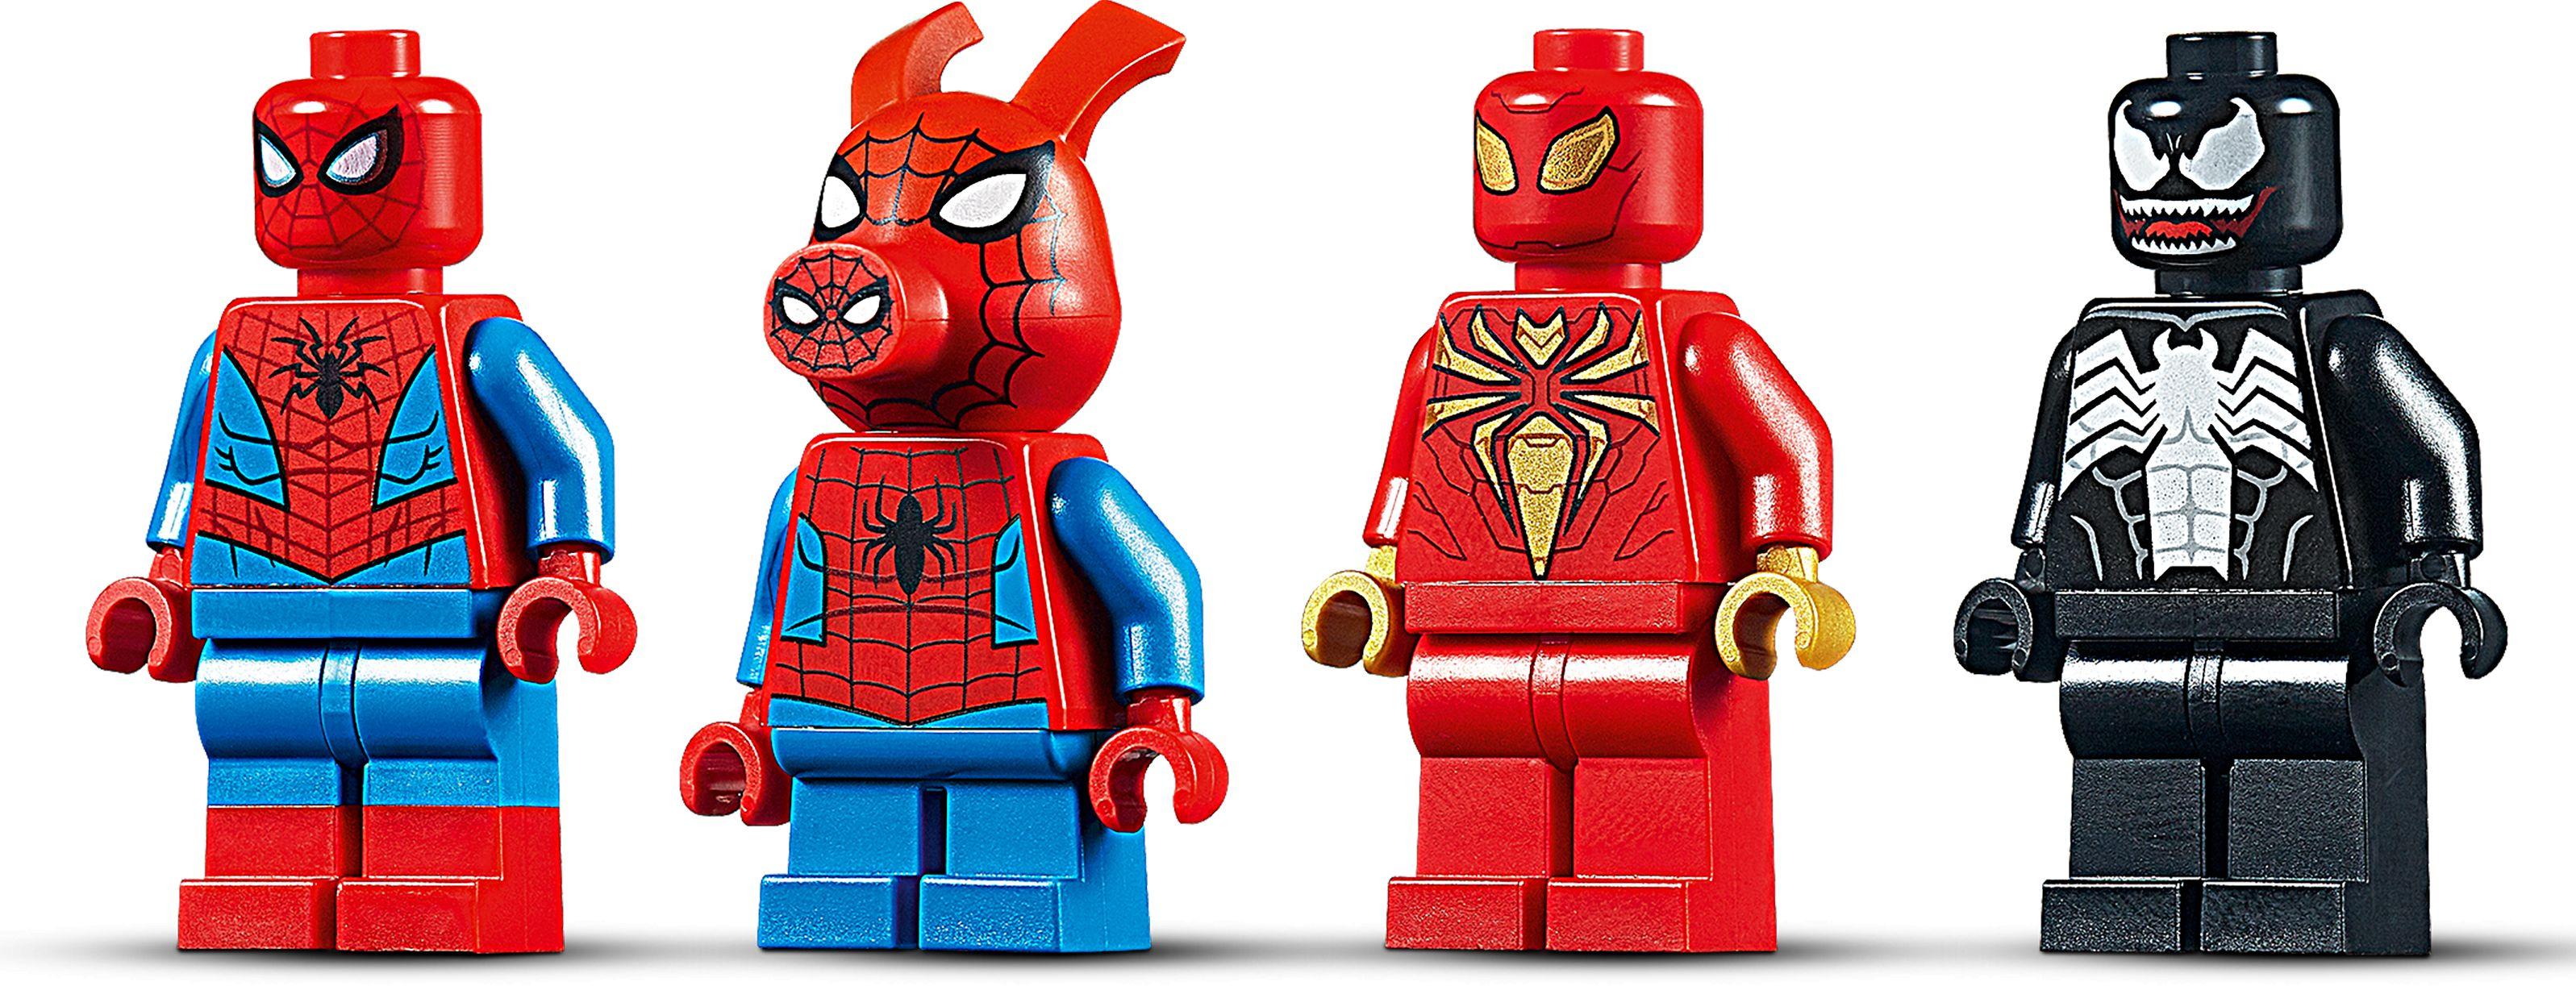 LEGO® Super Heroes 76151 Spider-Man vs. Venom